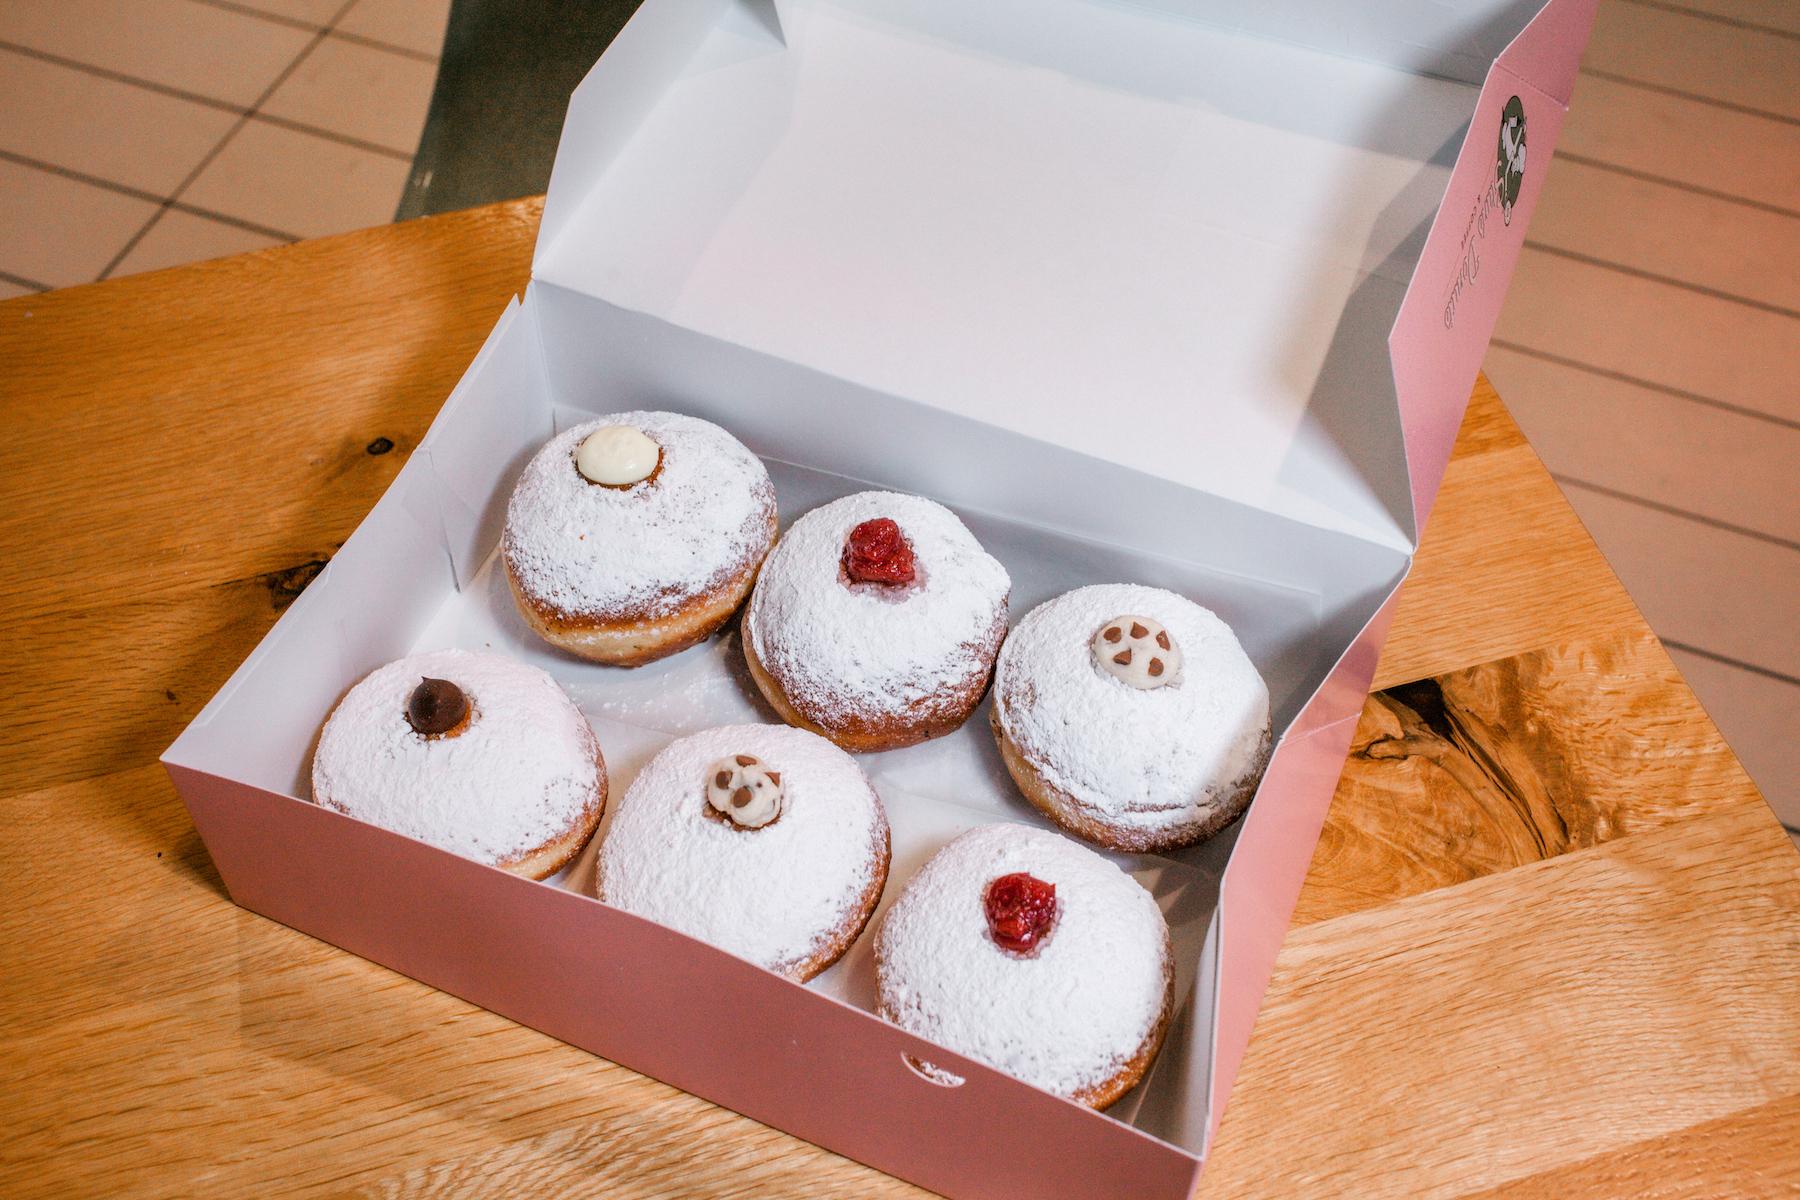 Stan's Donuts paczki